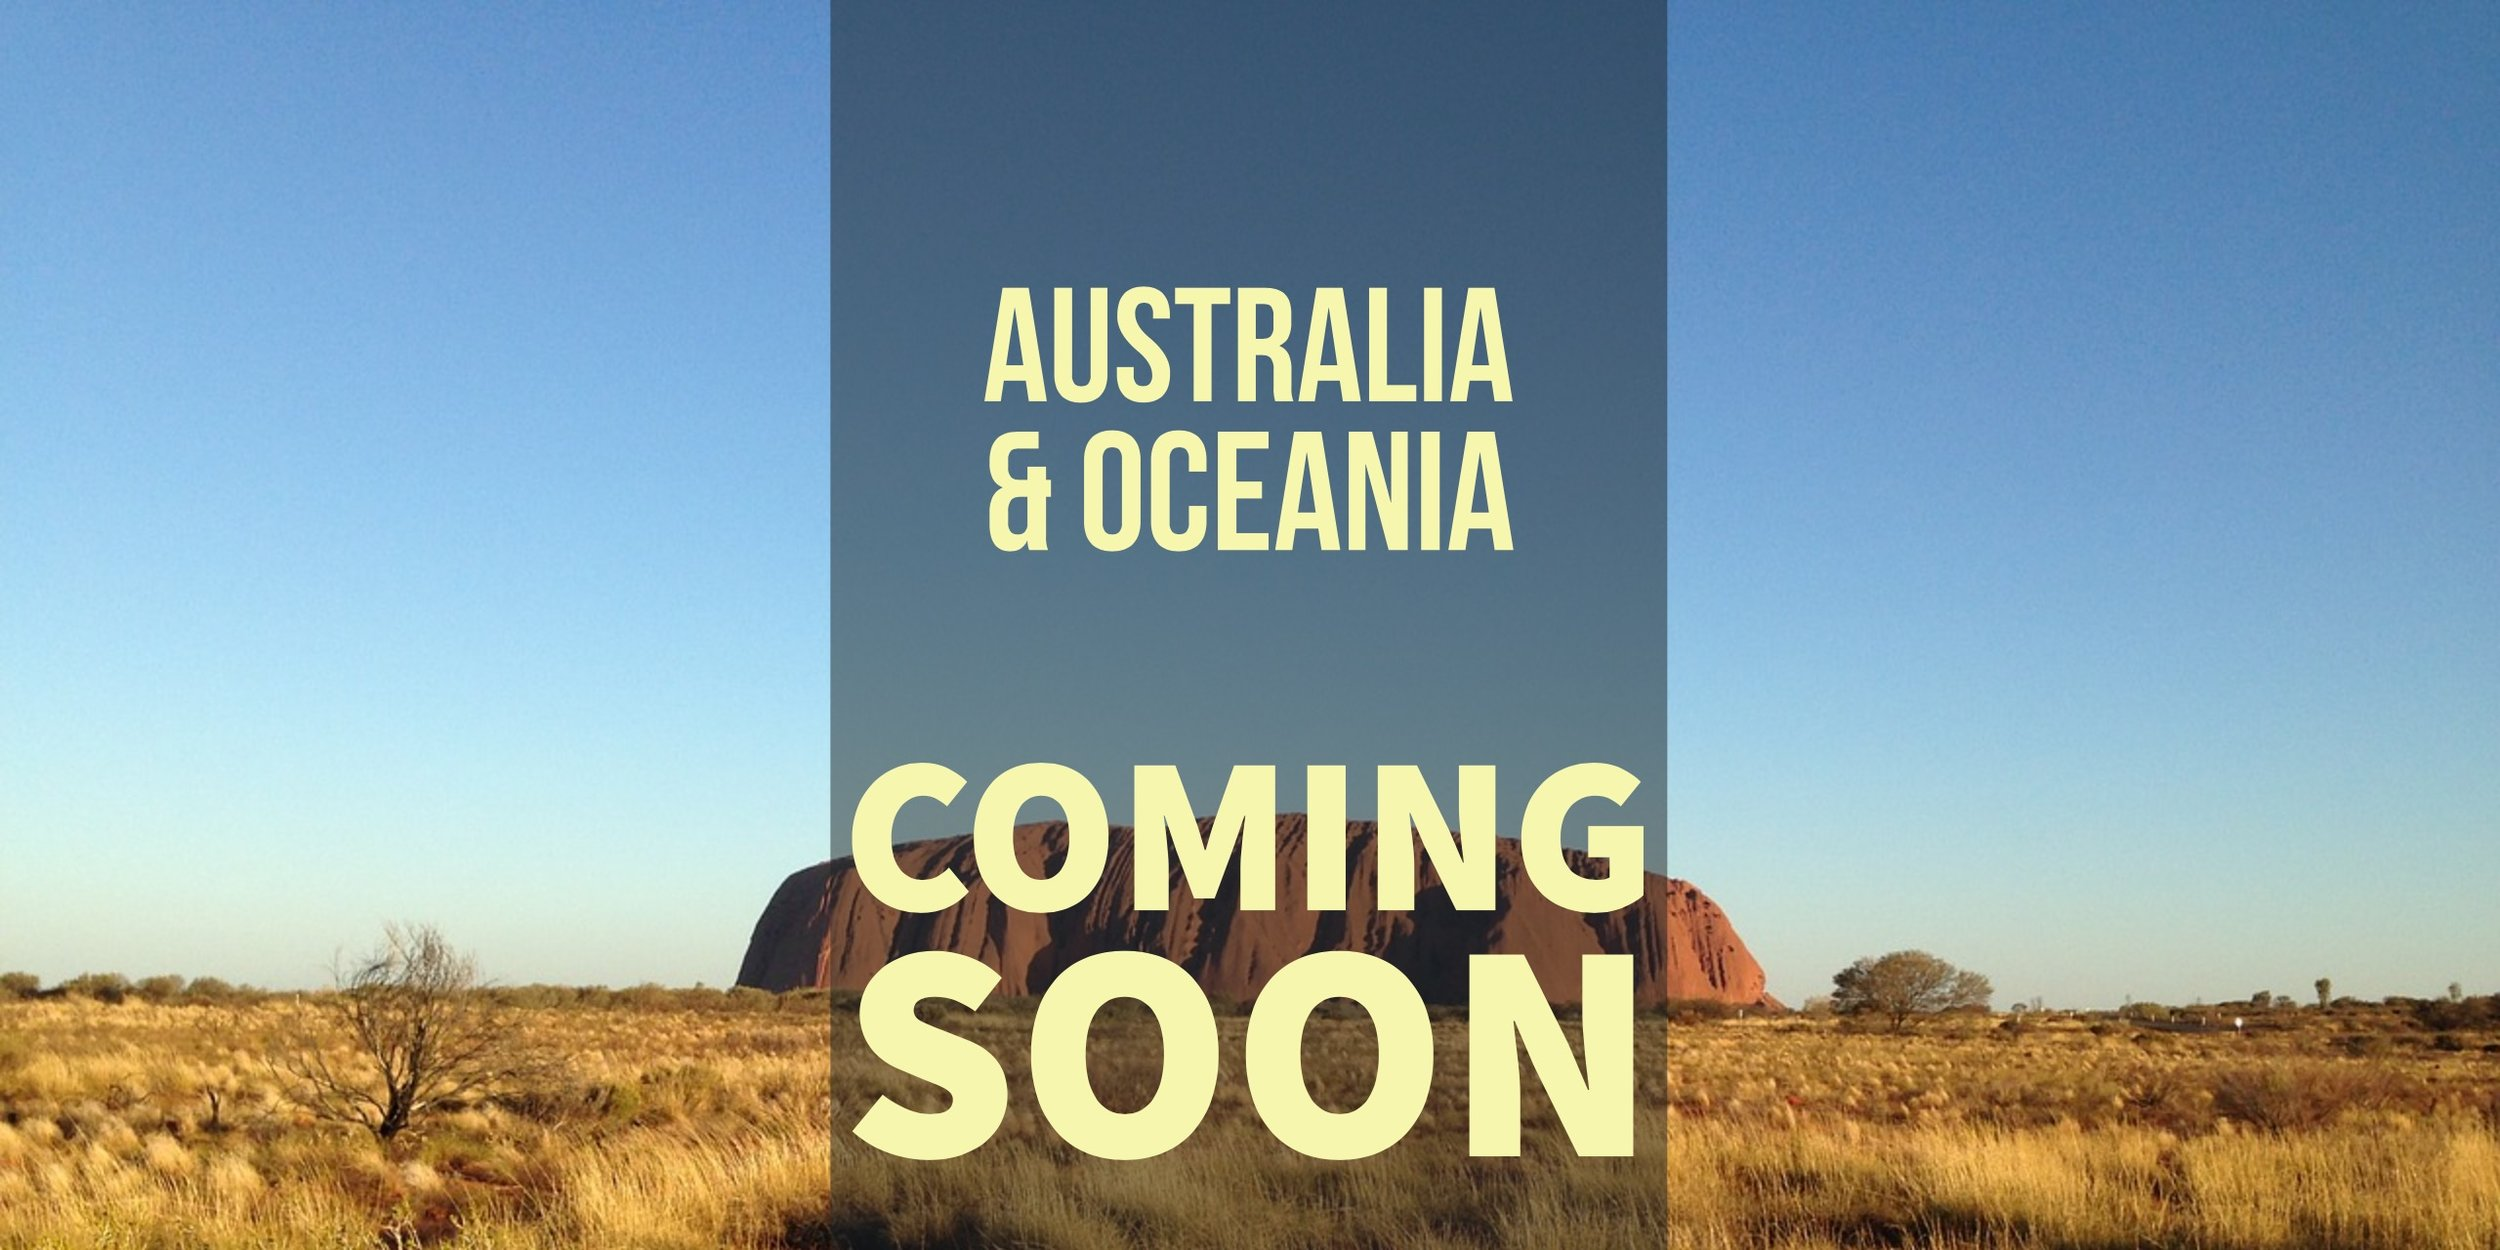 Australia & Oceania Coming Soon